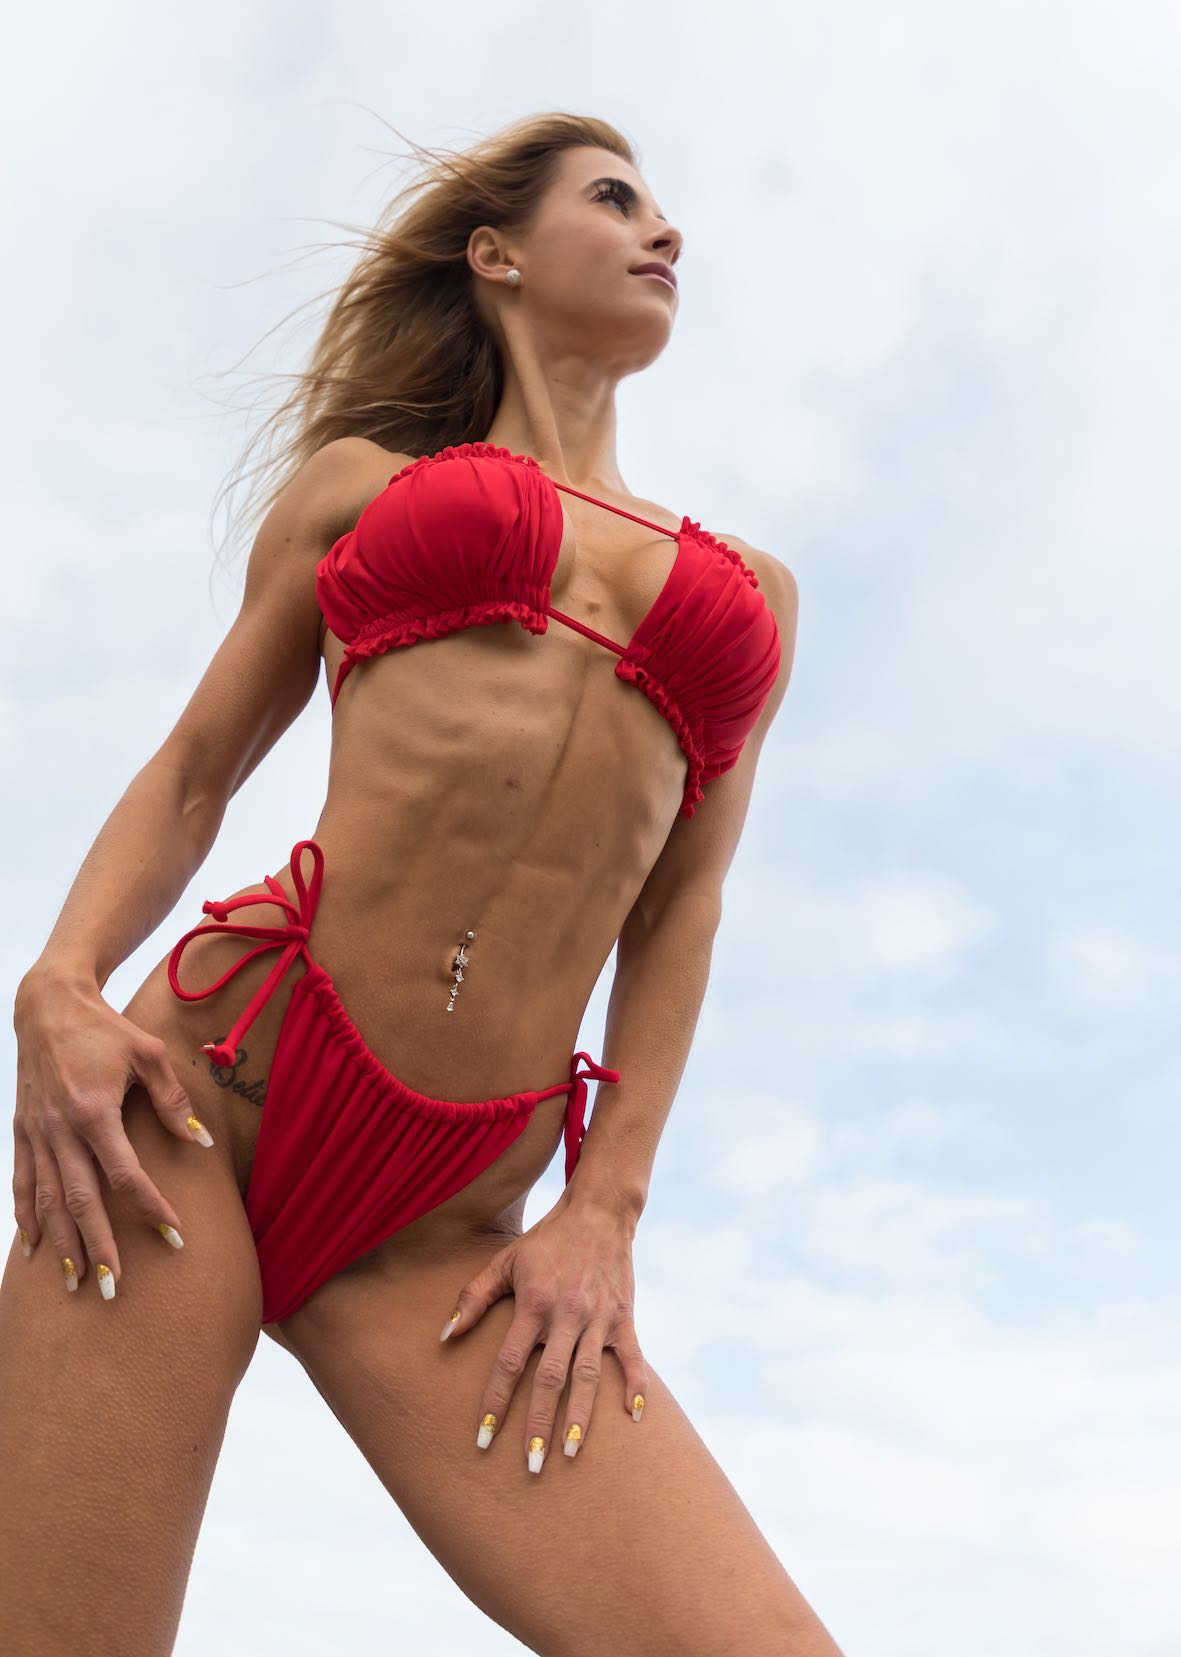 Meet our LW Babe Melissa CynthiaRoest